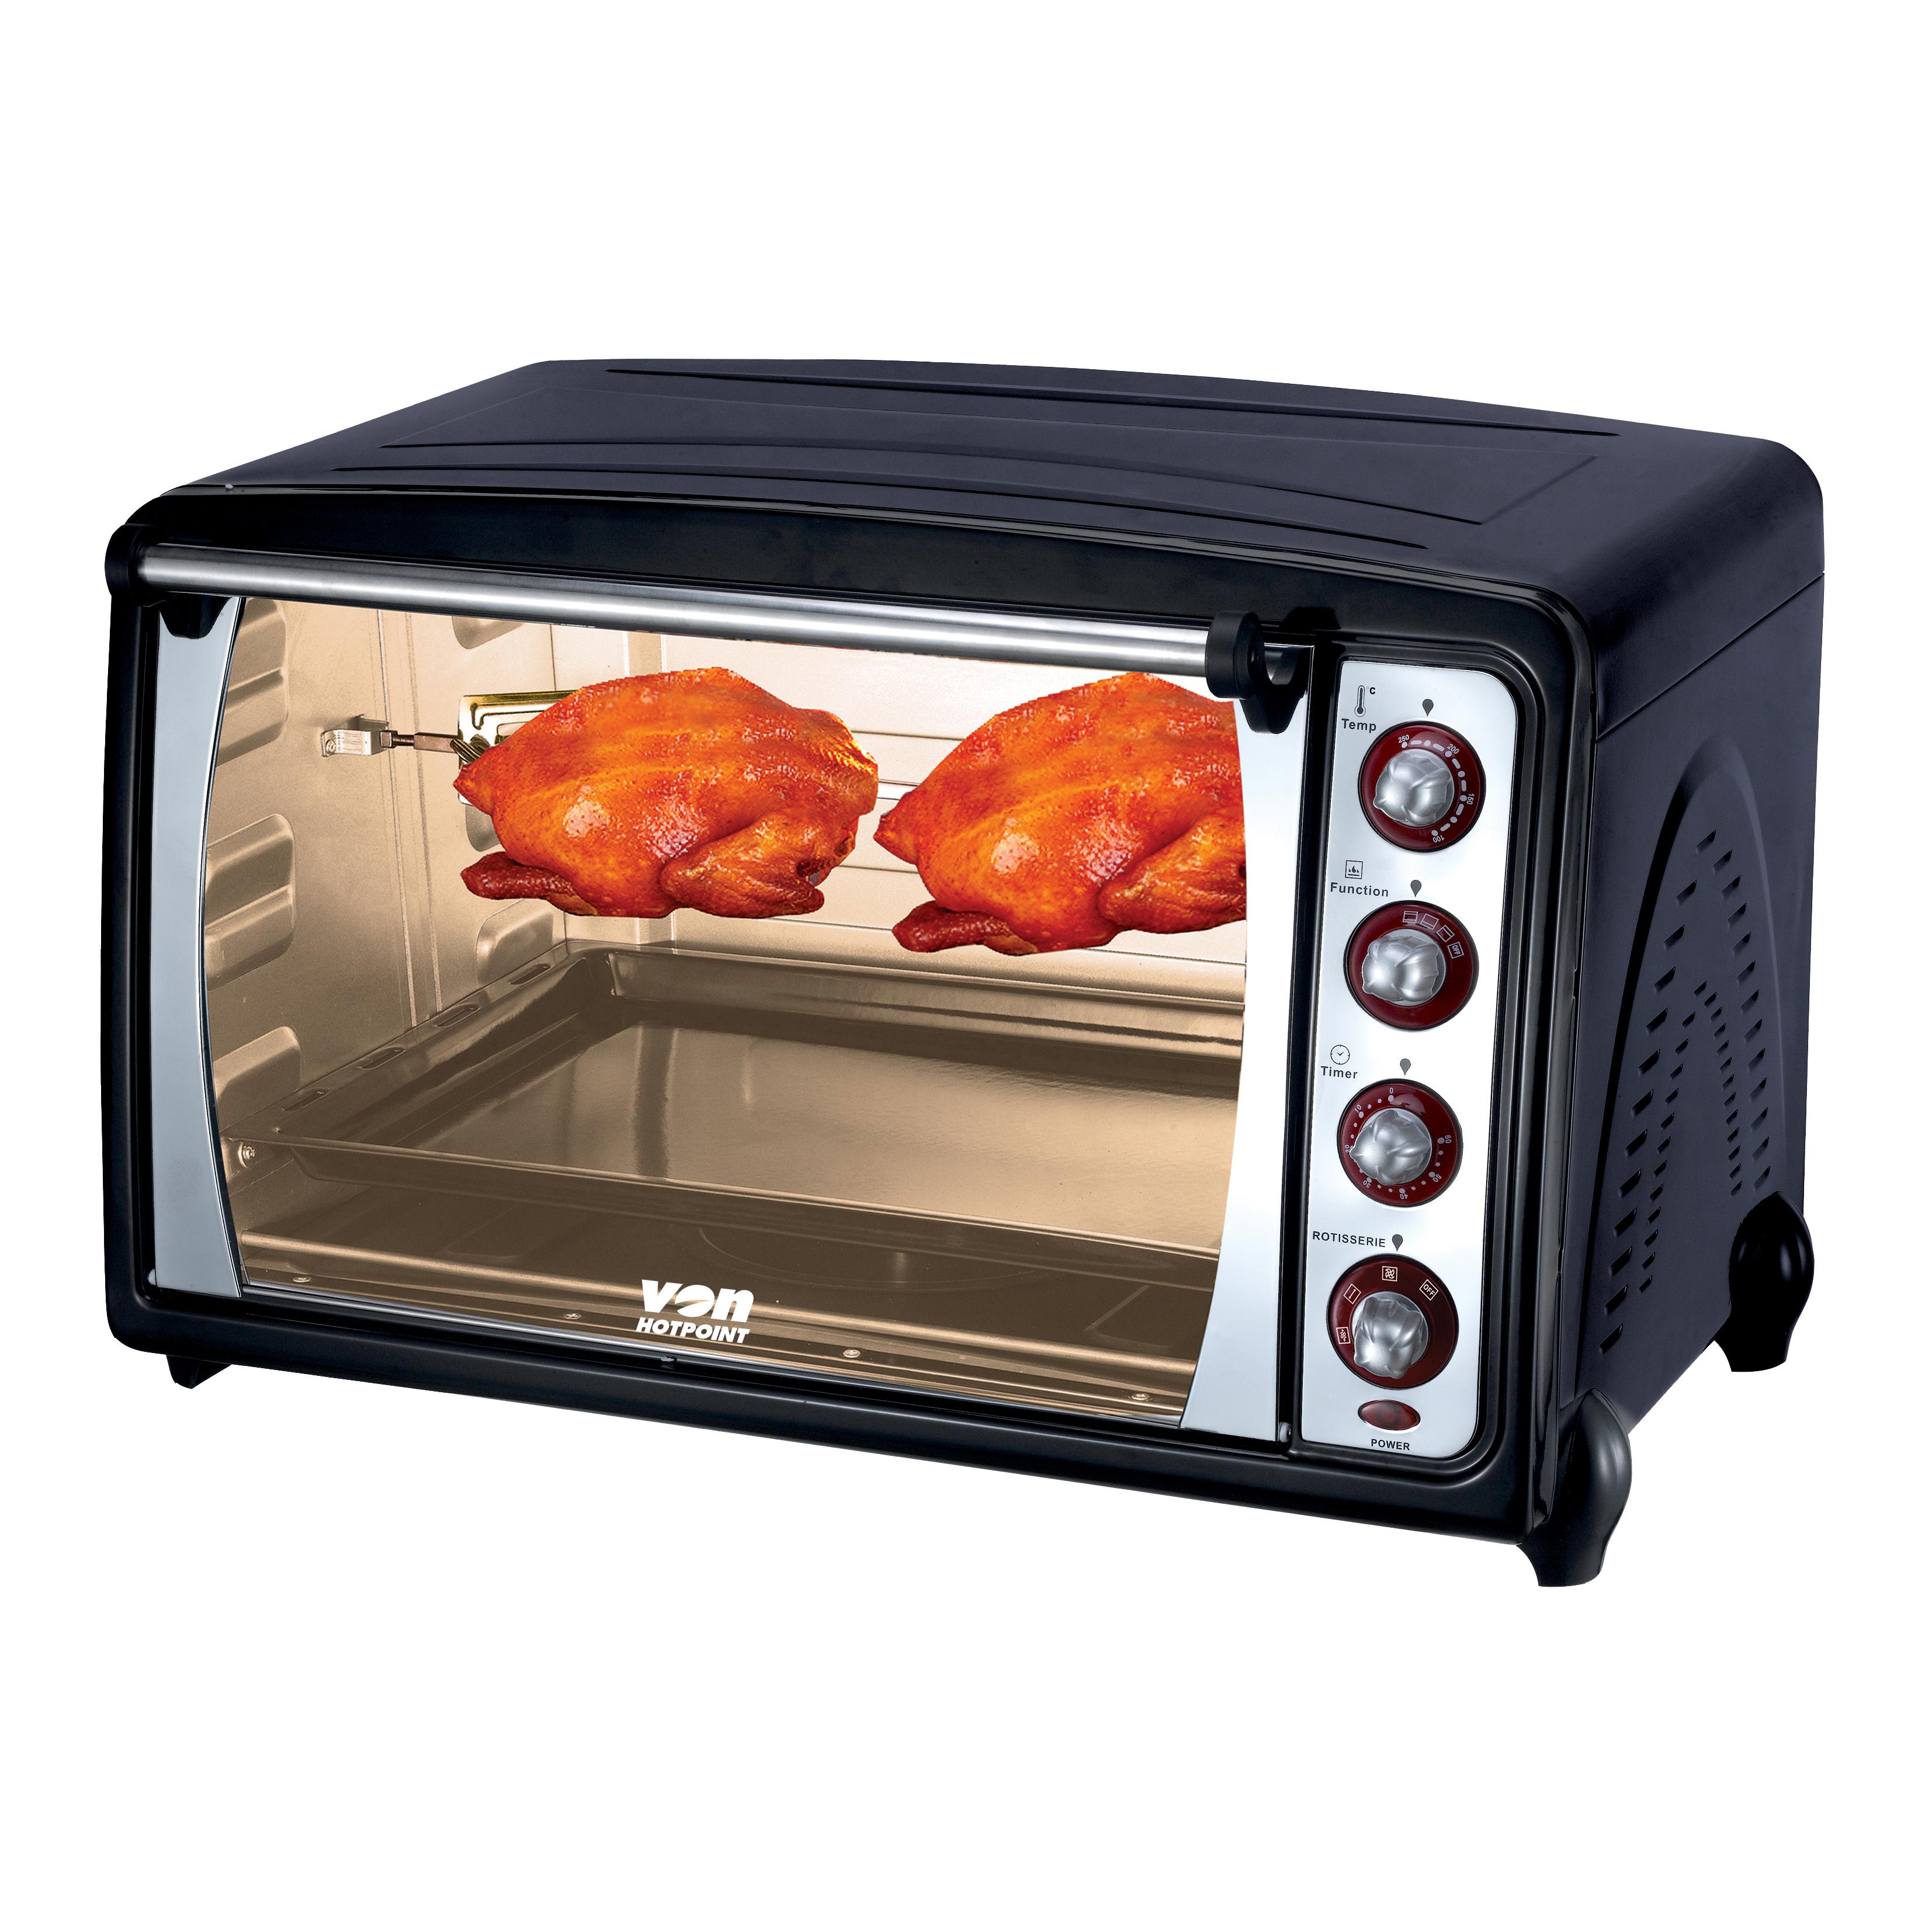 Elites Age Supermarket- Home Appliances, Microwave, Grill, Oven